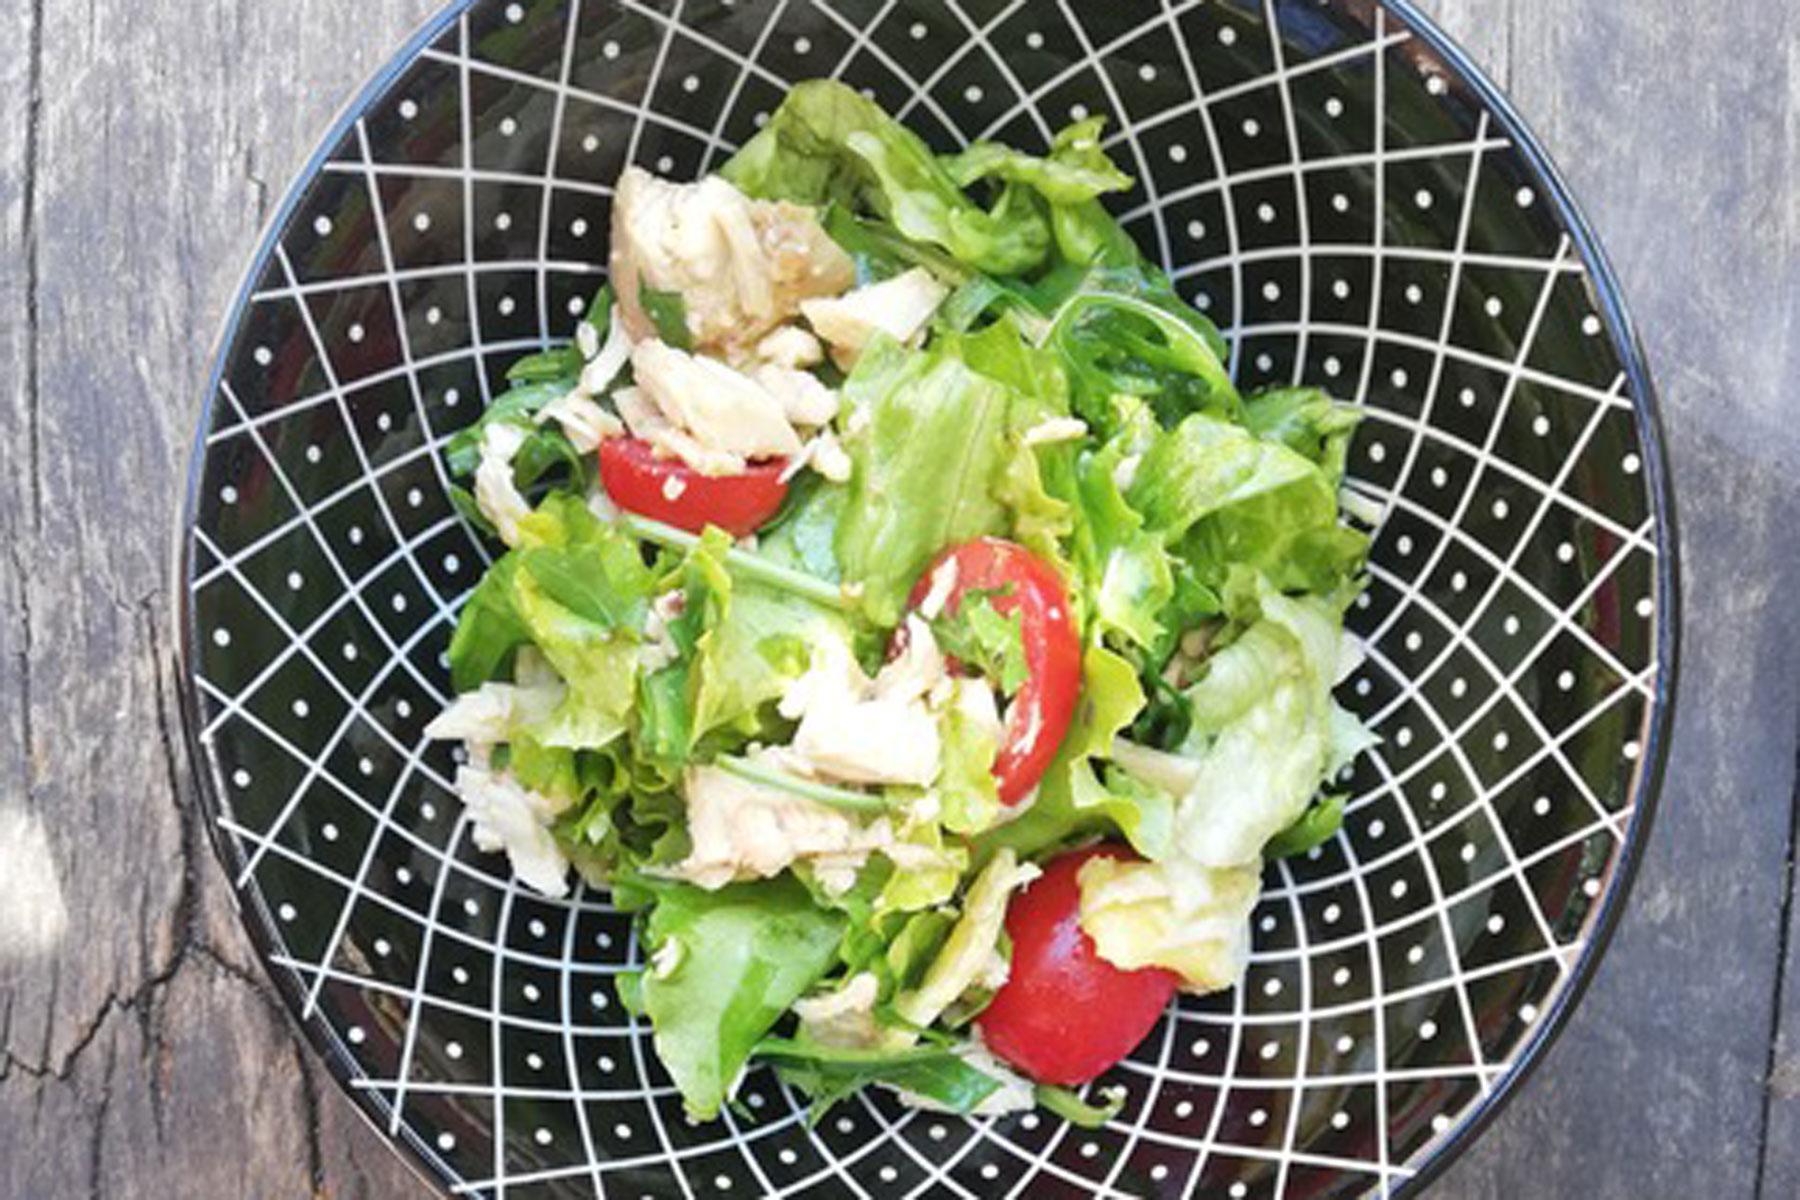 Modena mariangela salad